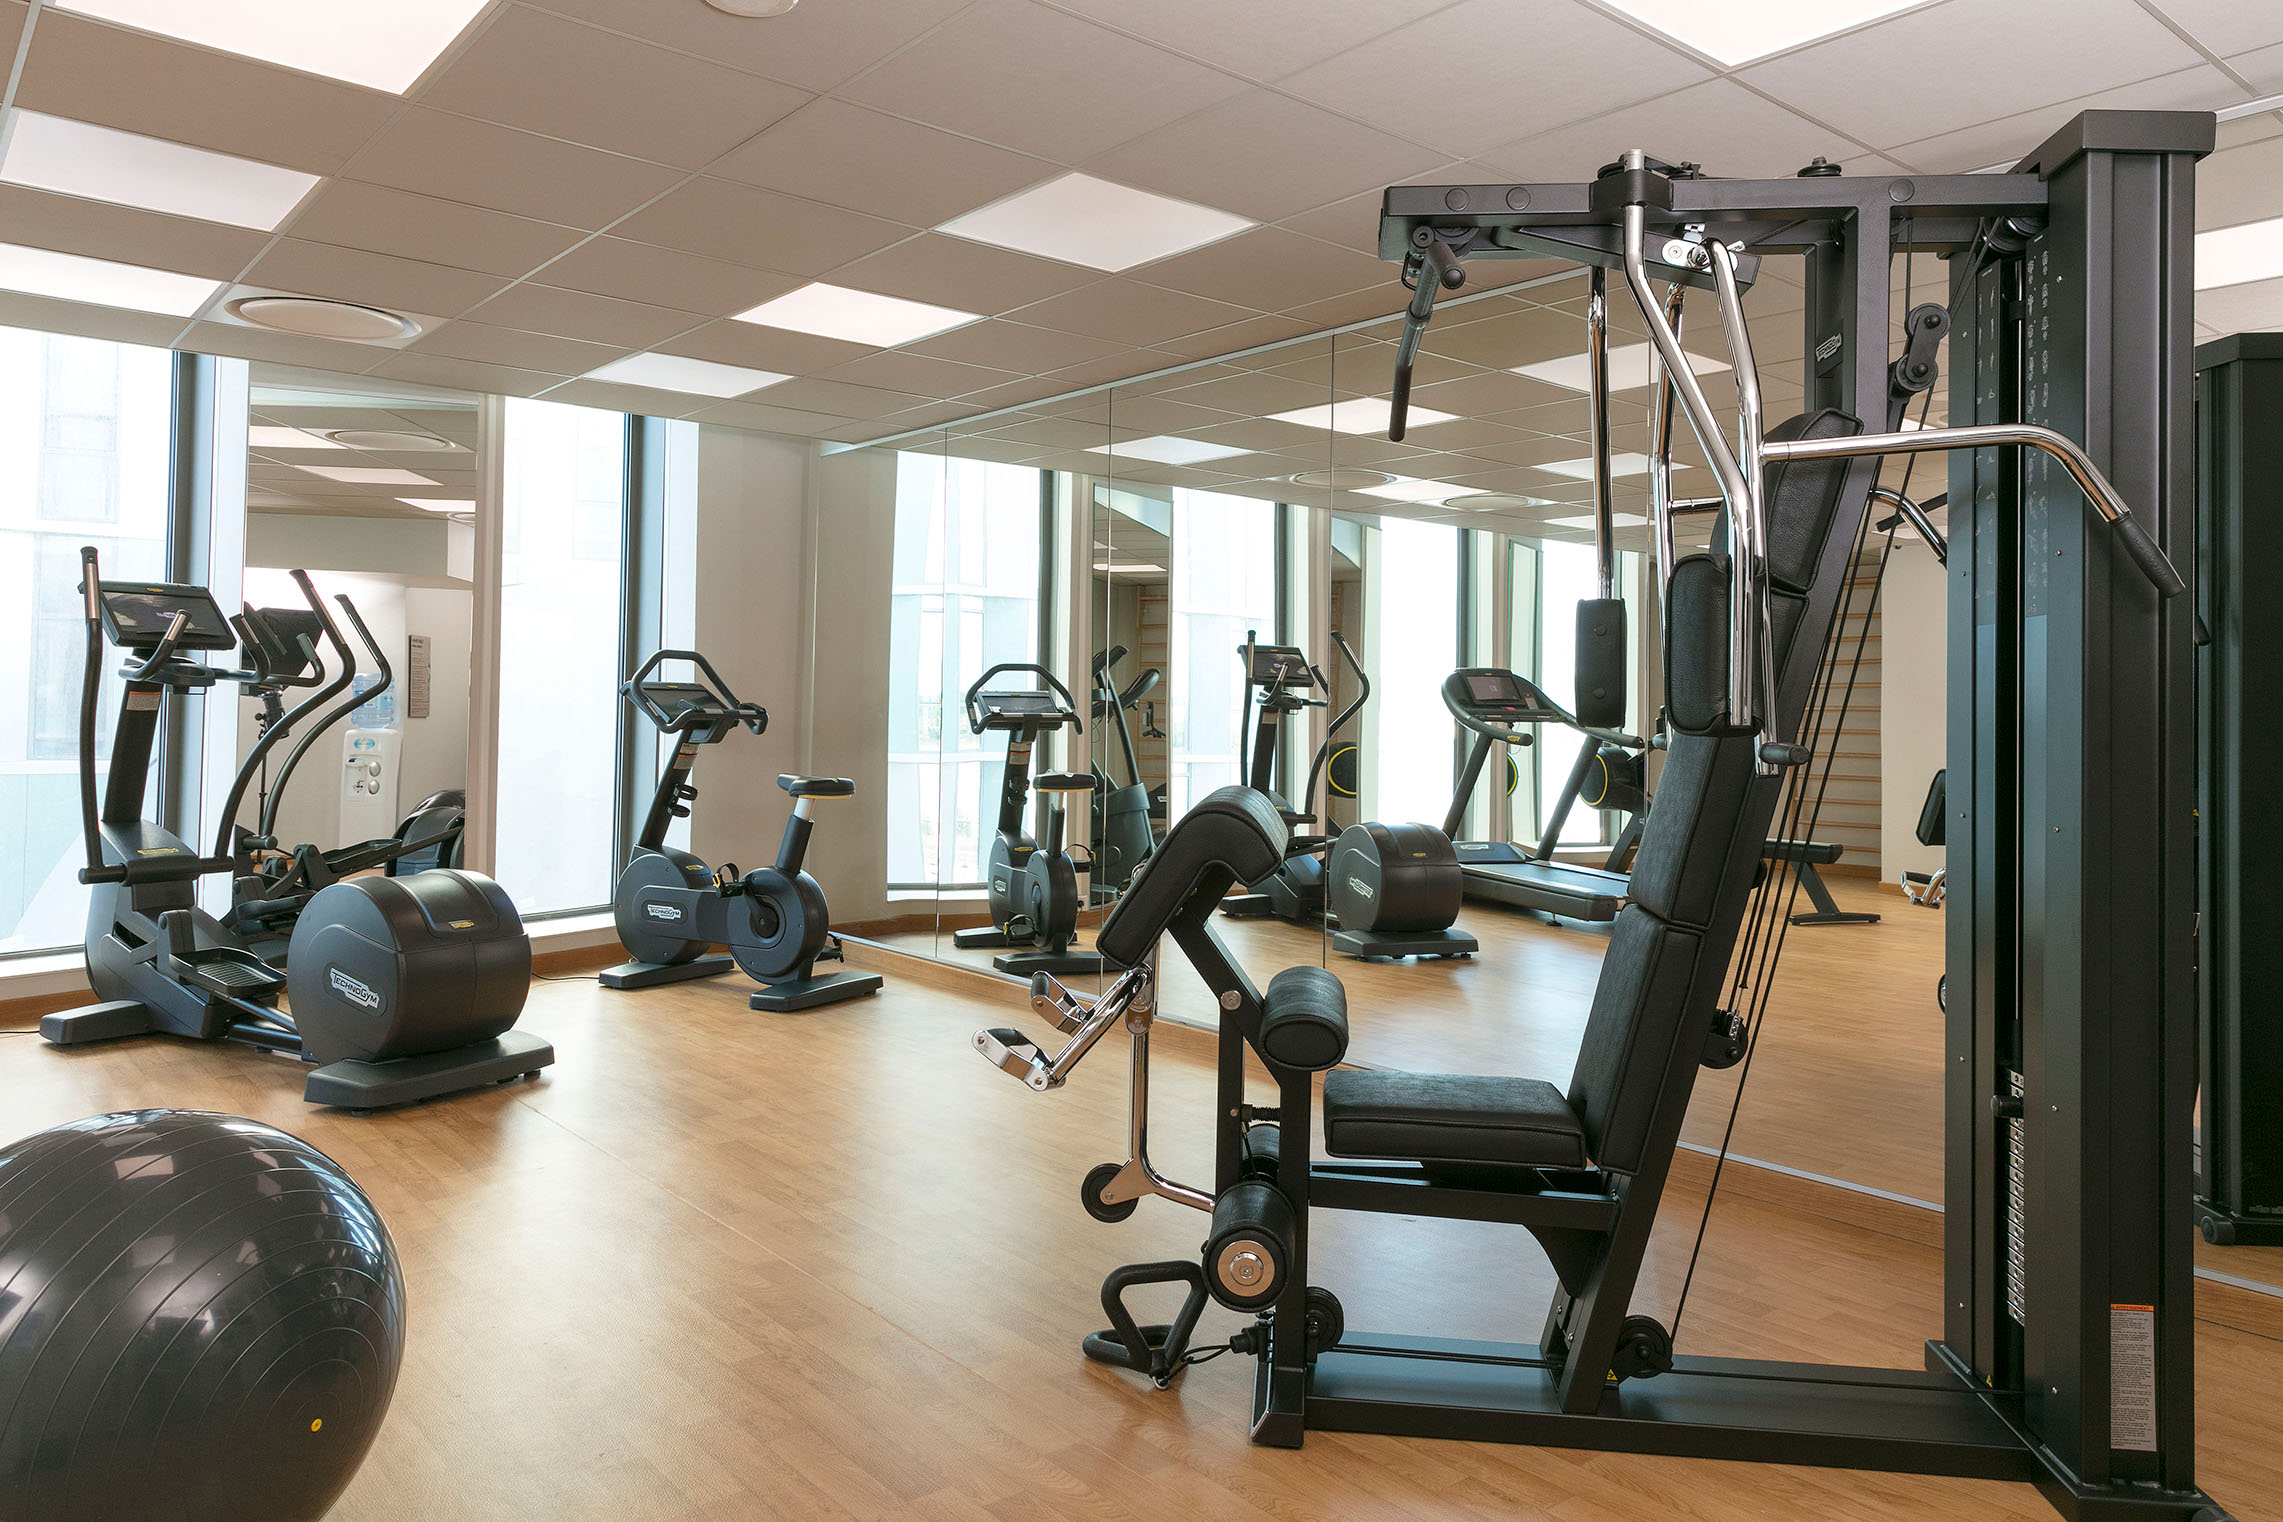 naos-bordeaux-centre-HGI-salle-fitness-vue-ensemble